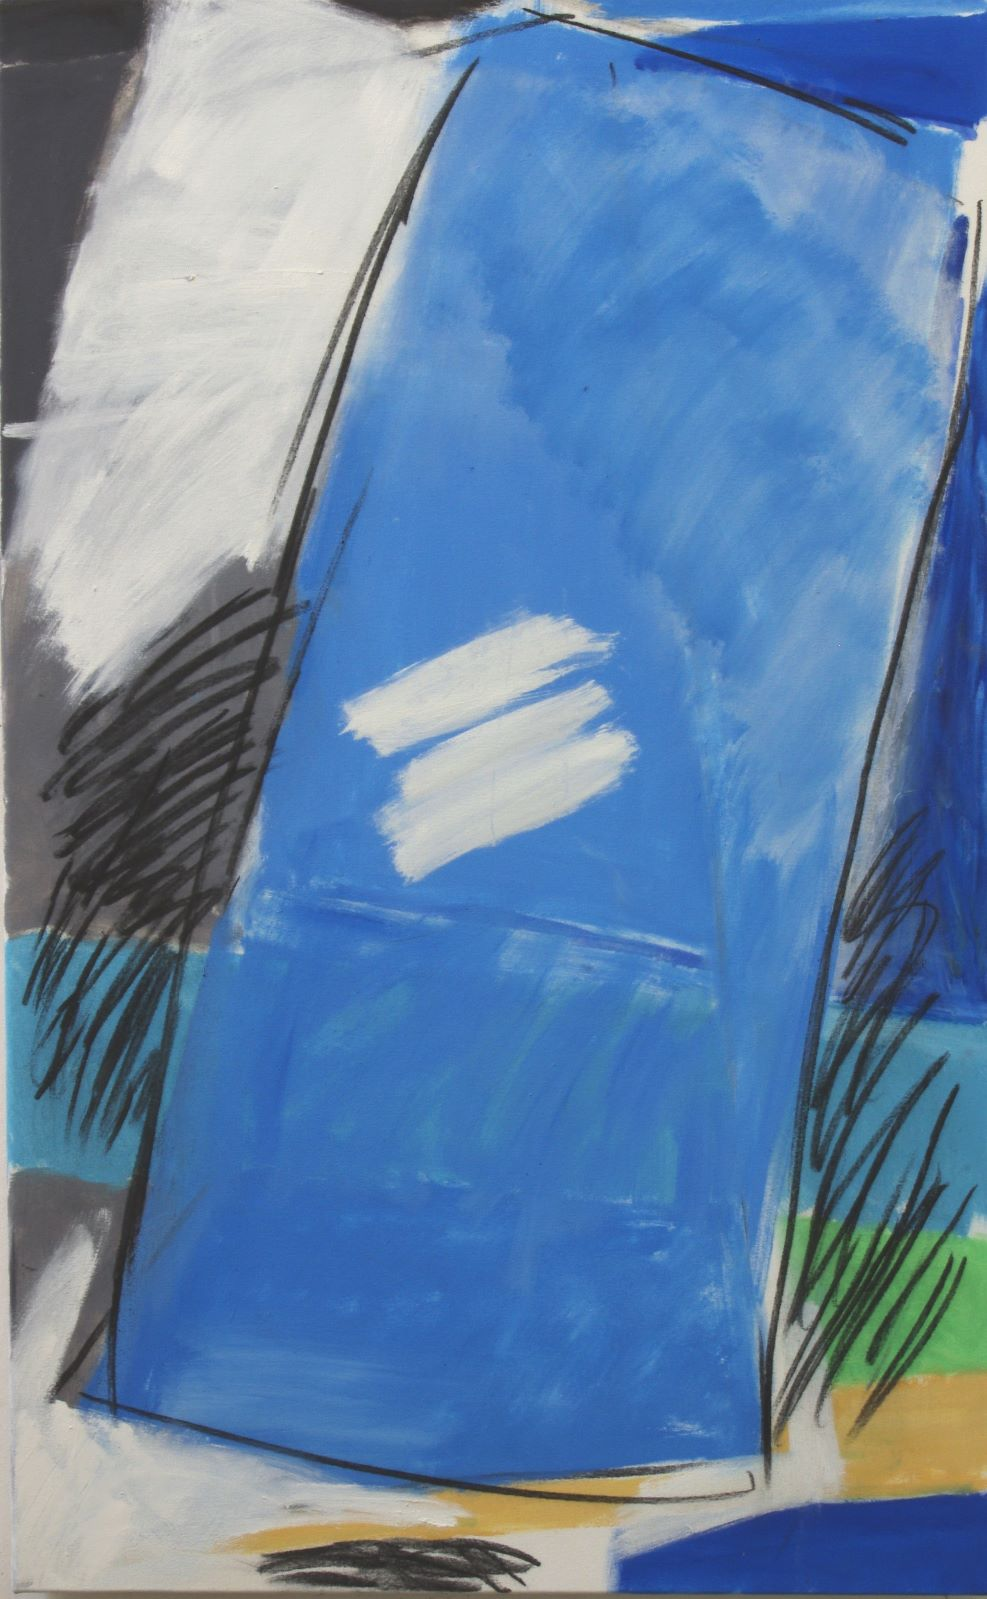 "Blue Topple ( 3'9"" x 2'4"" / 155 x 71 cm )"